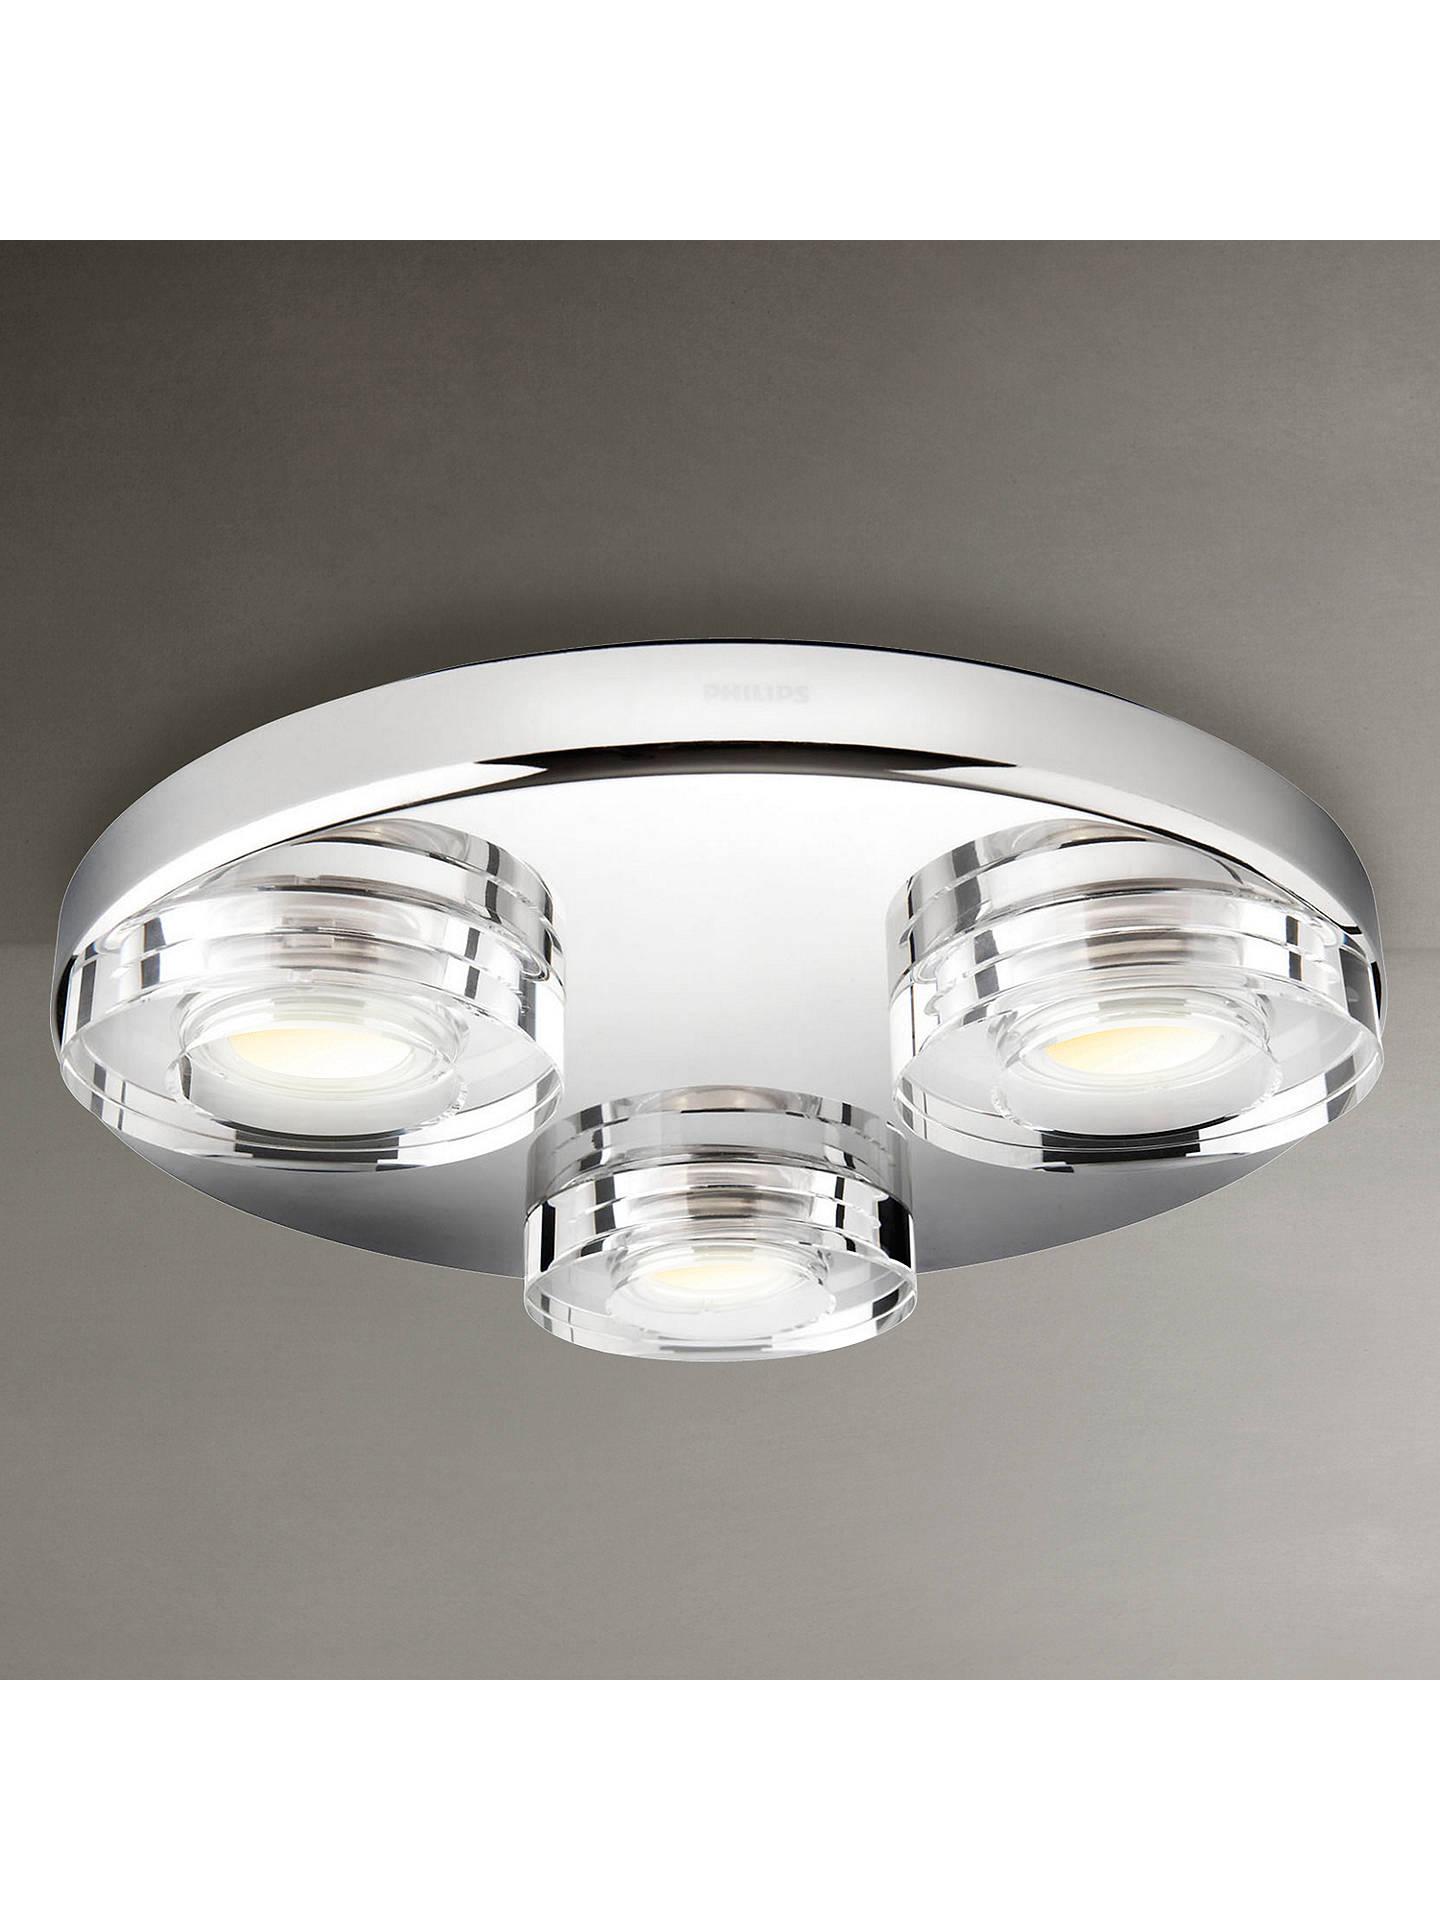 Philips Mira 3 Bulb Led Bathroom Light At John Lewis Partners